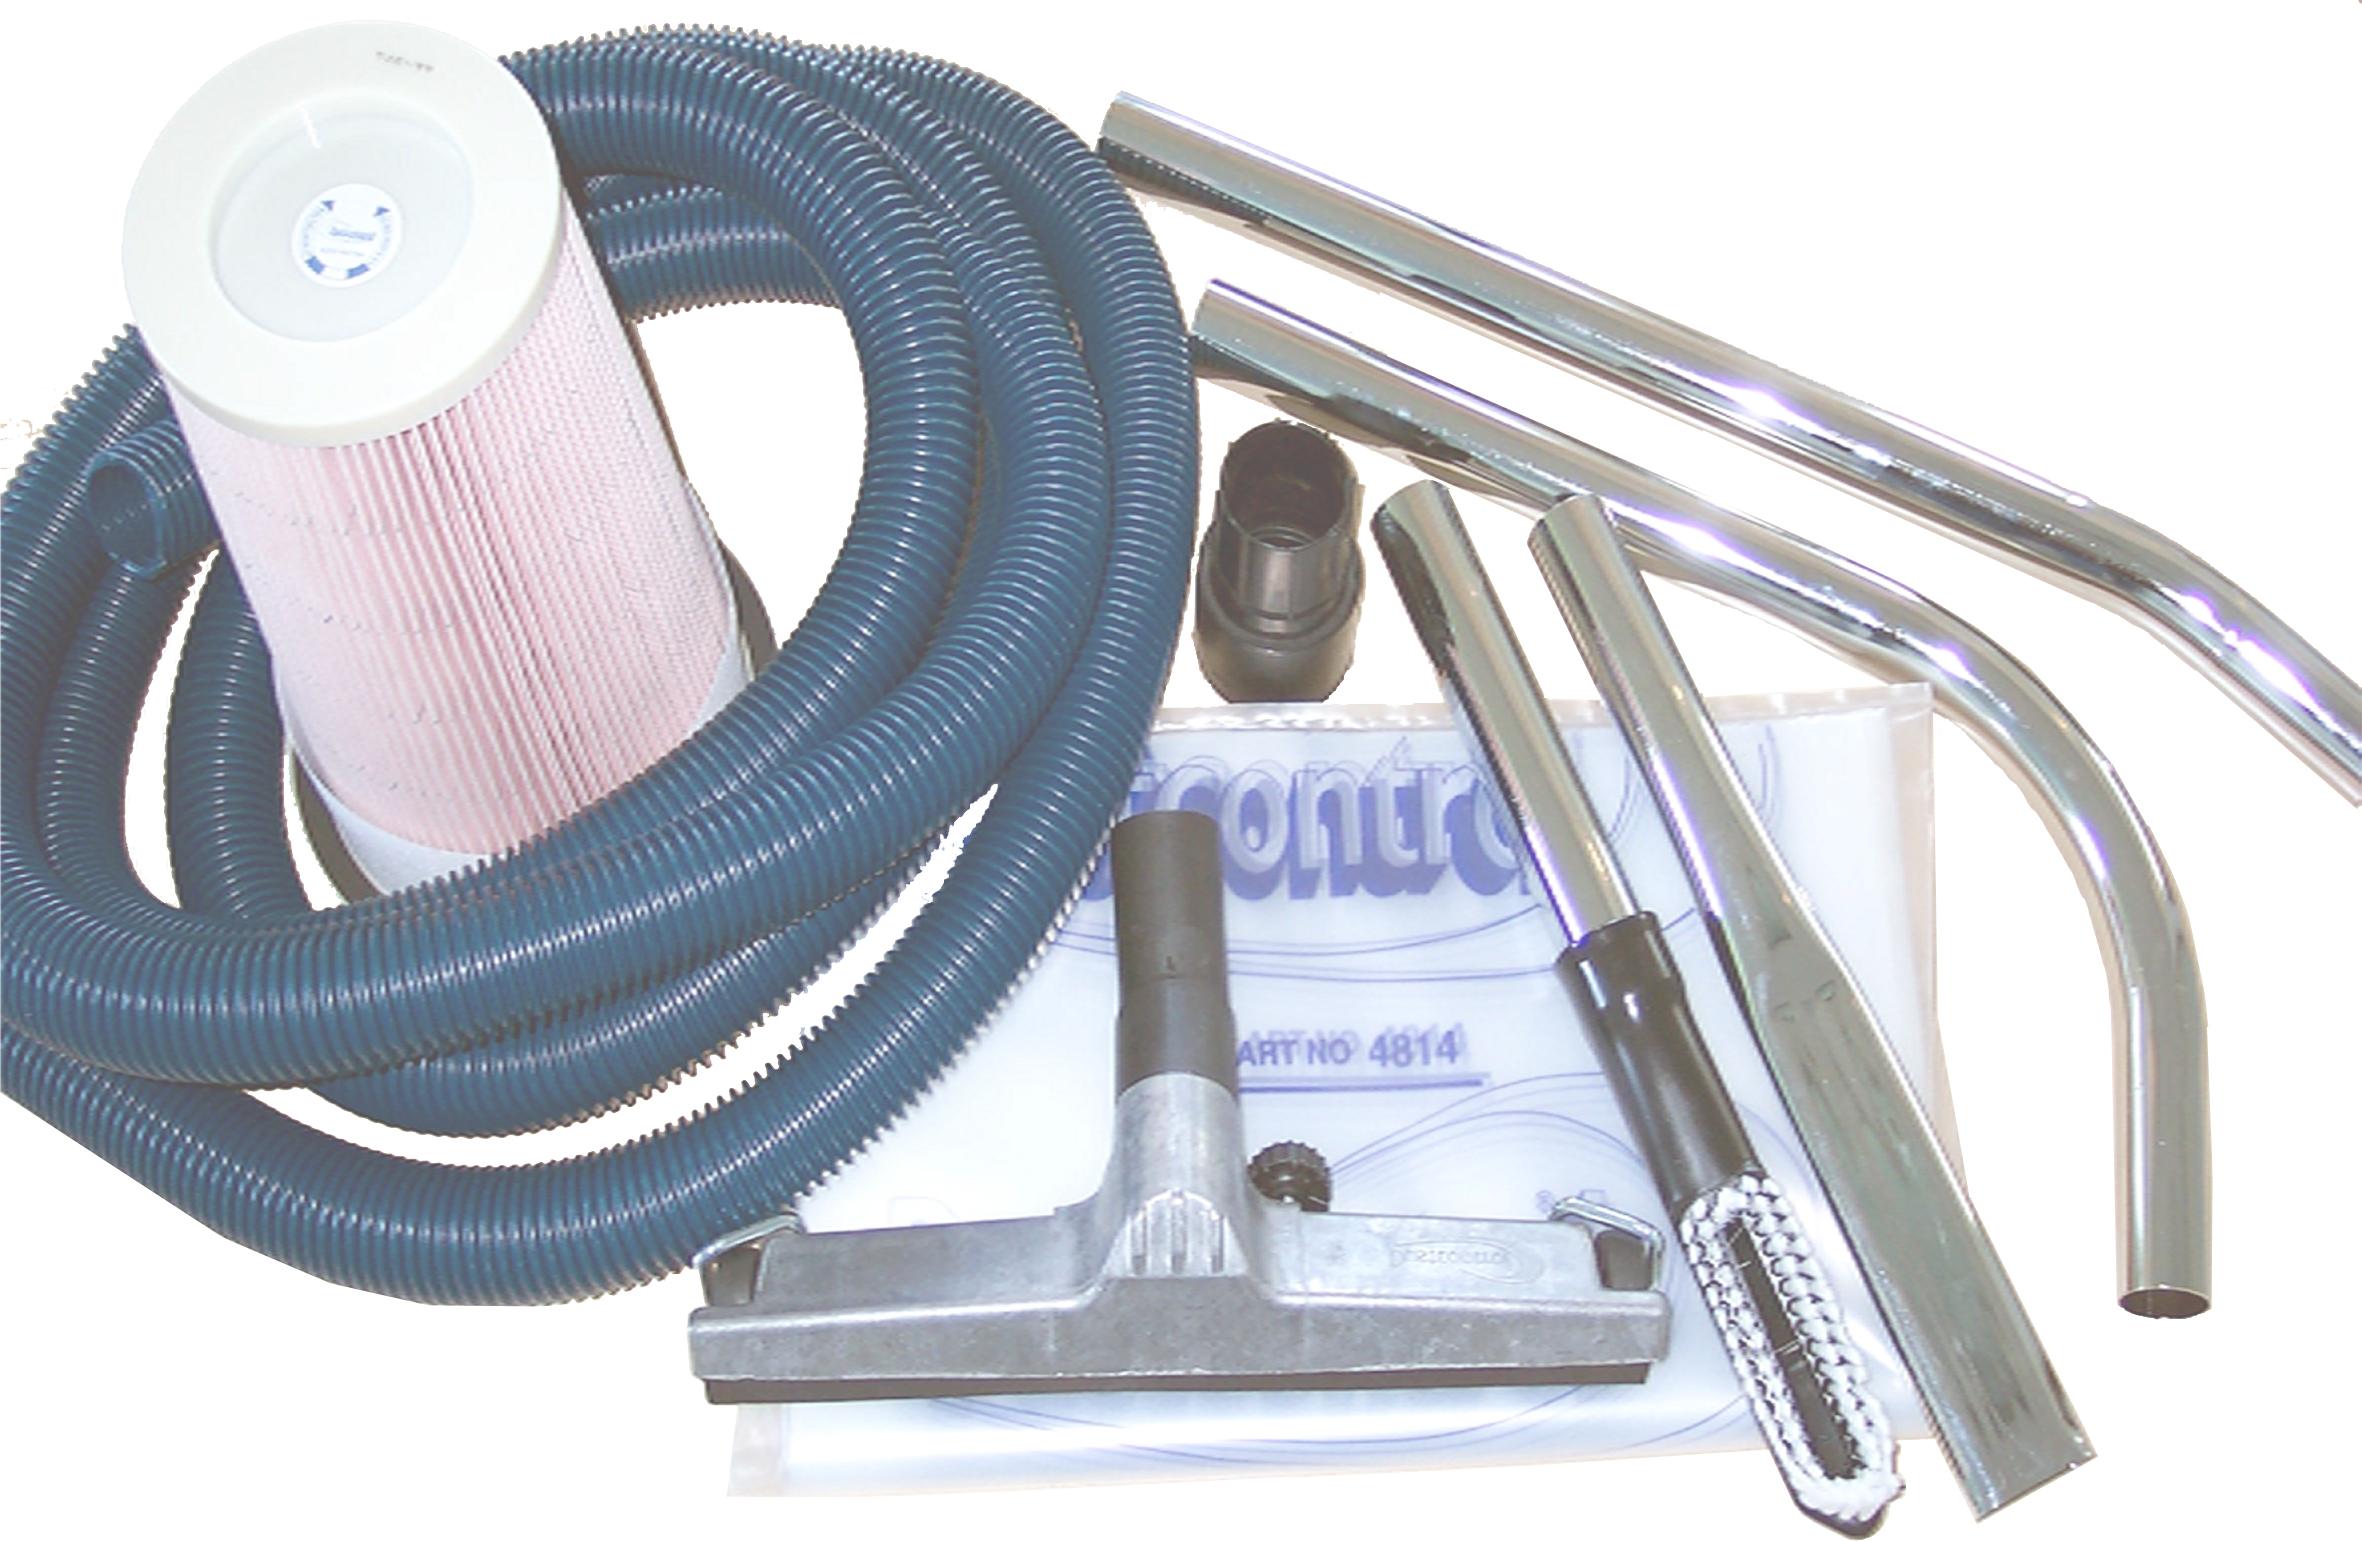 dustcontrol-accessoire-stofzuigerslang-afzuigkap-stofzuigerzak-control-voorden